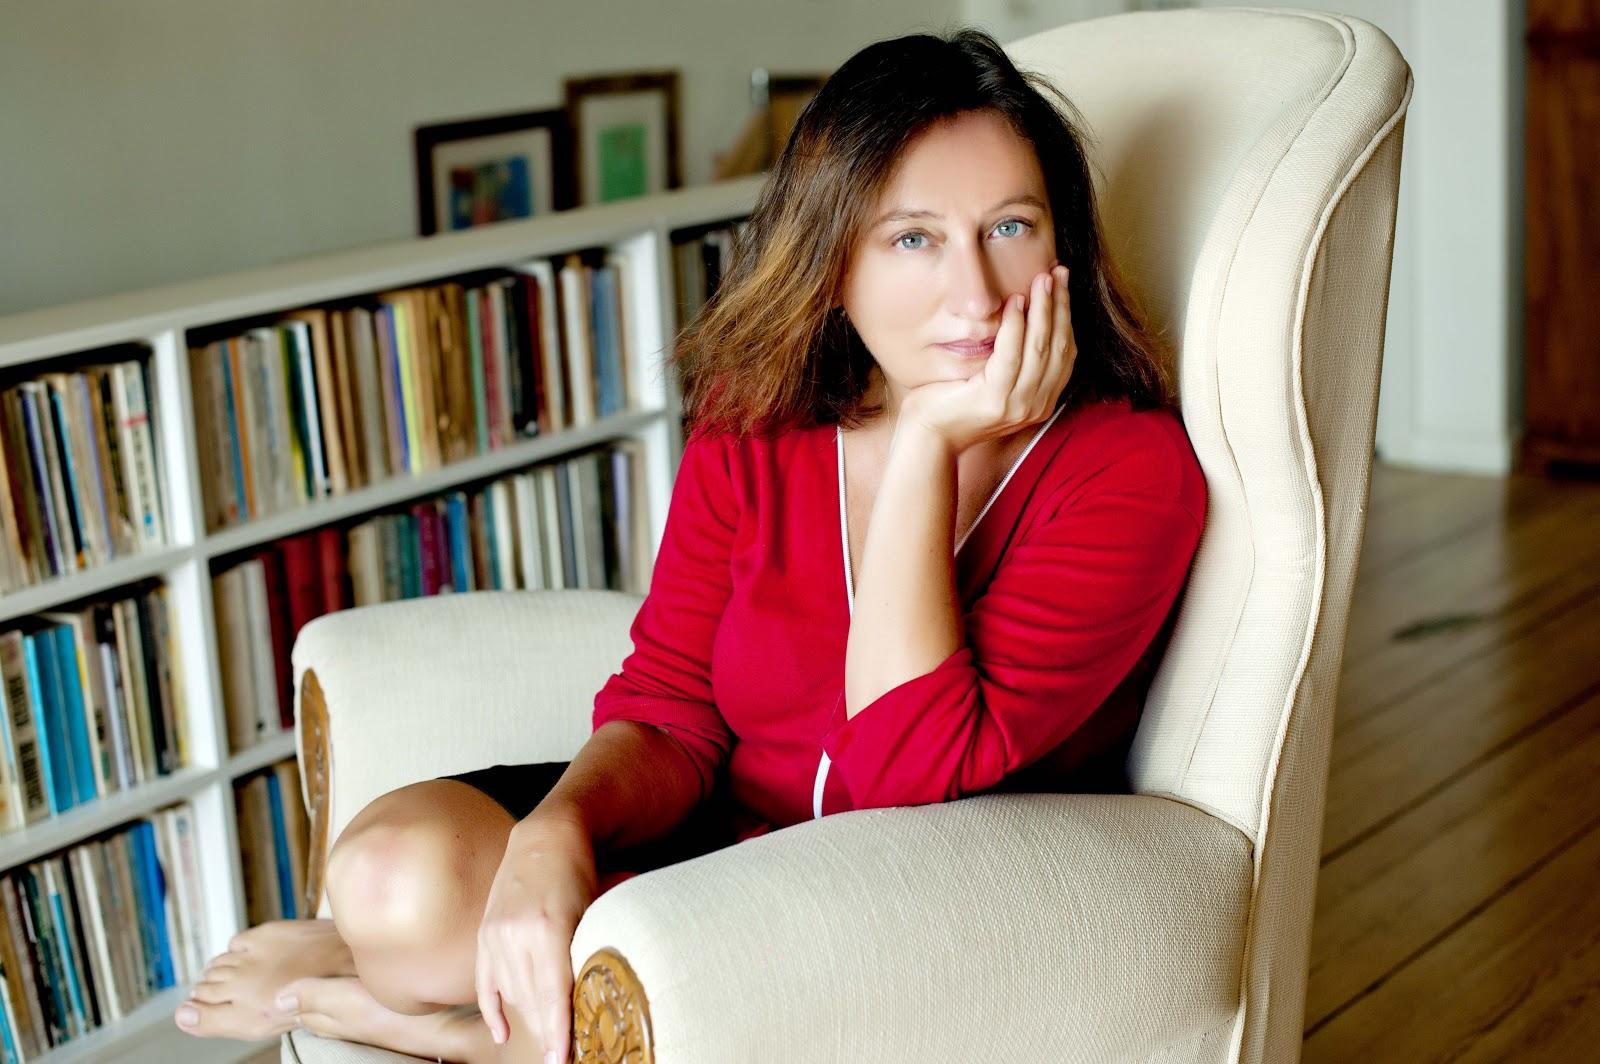 Perihan Mağden photographiée chez elle par  Muhsin Akgün . ©Muhsin Akgün.